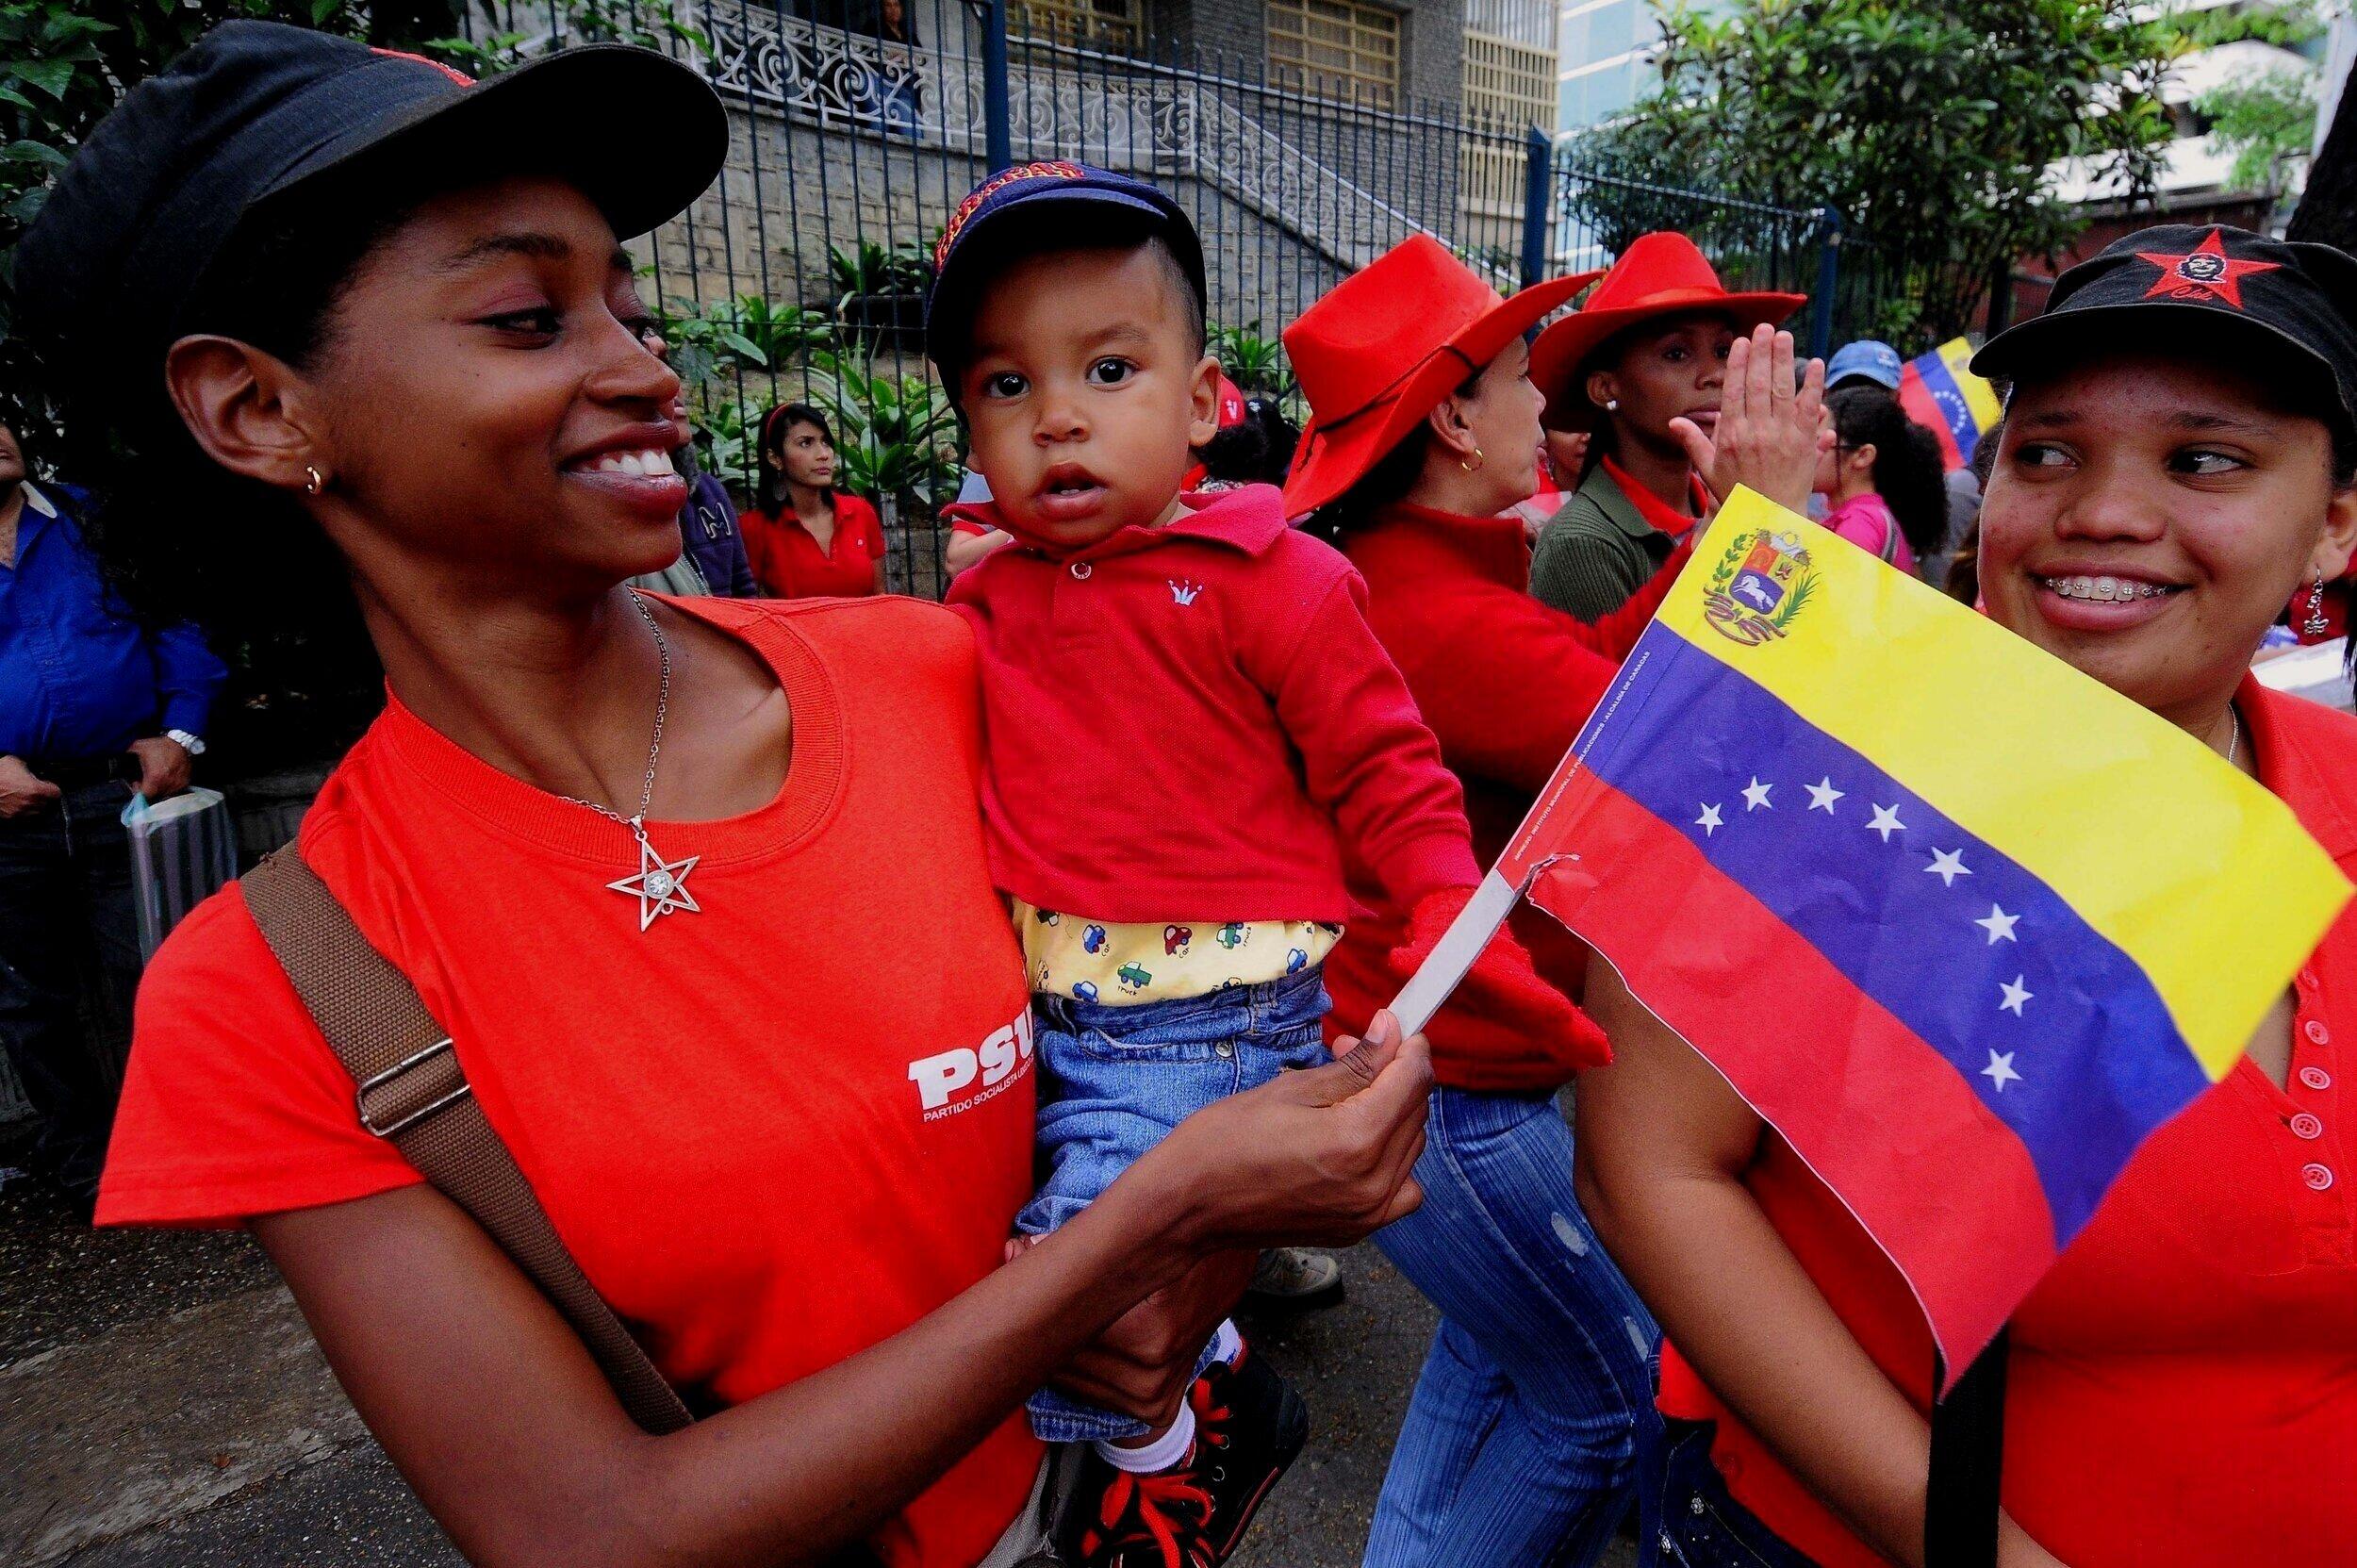 venezuelan people 2020 - 1000×665